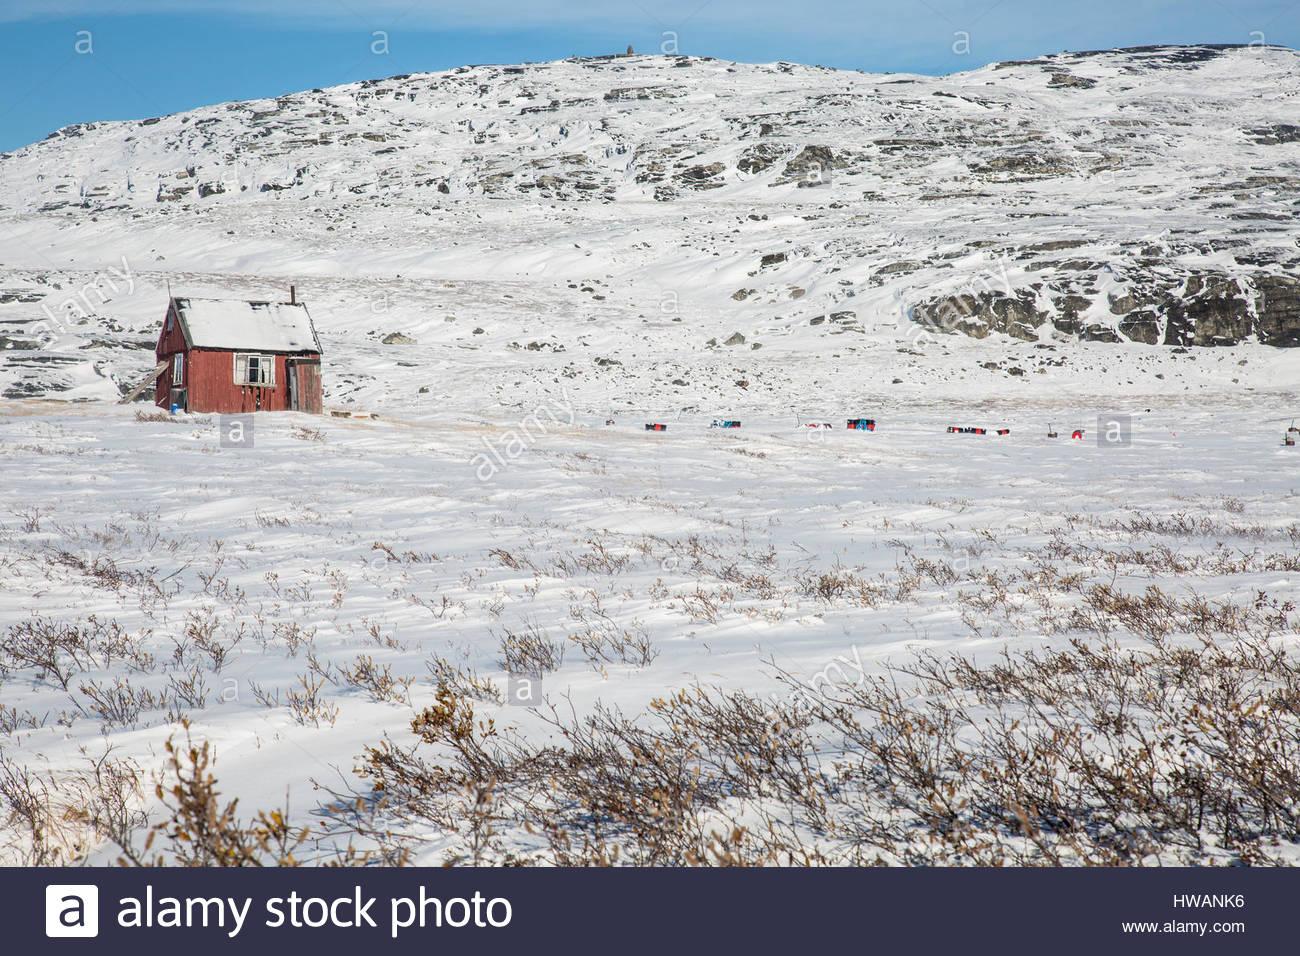 lone red greenlandic home snowy landscape Stock Photo